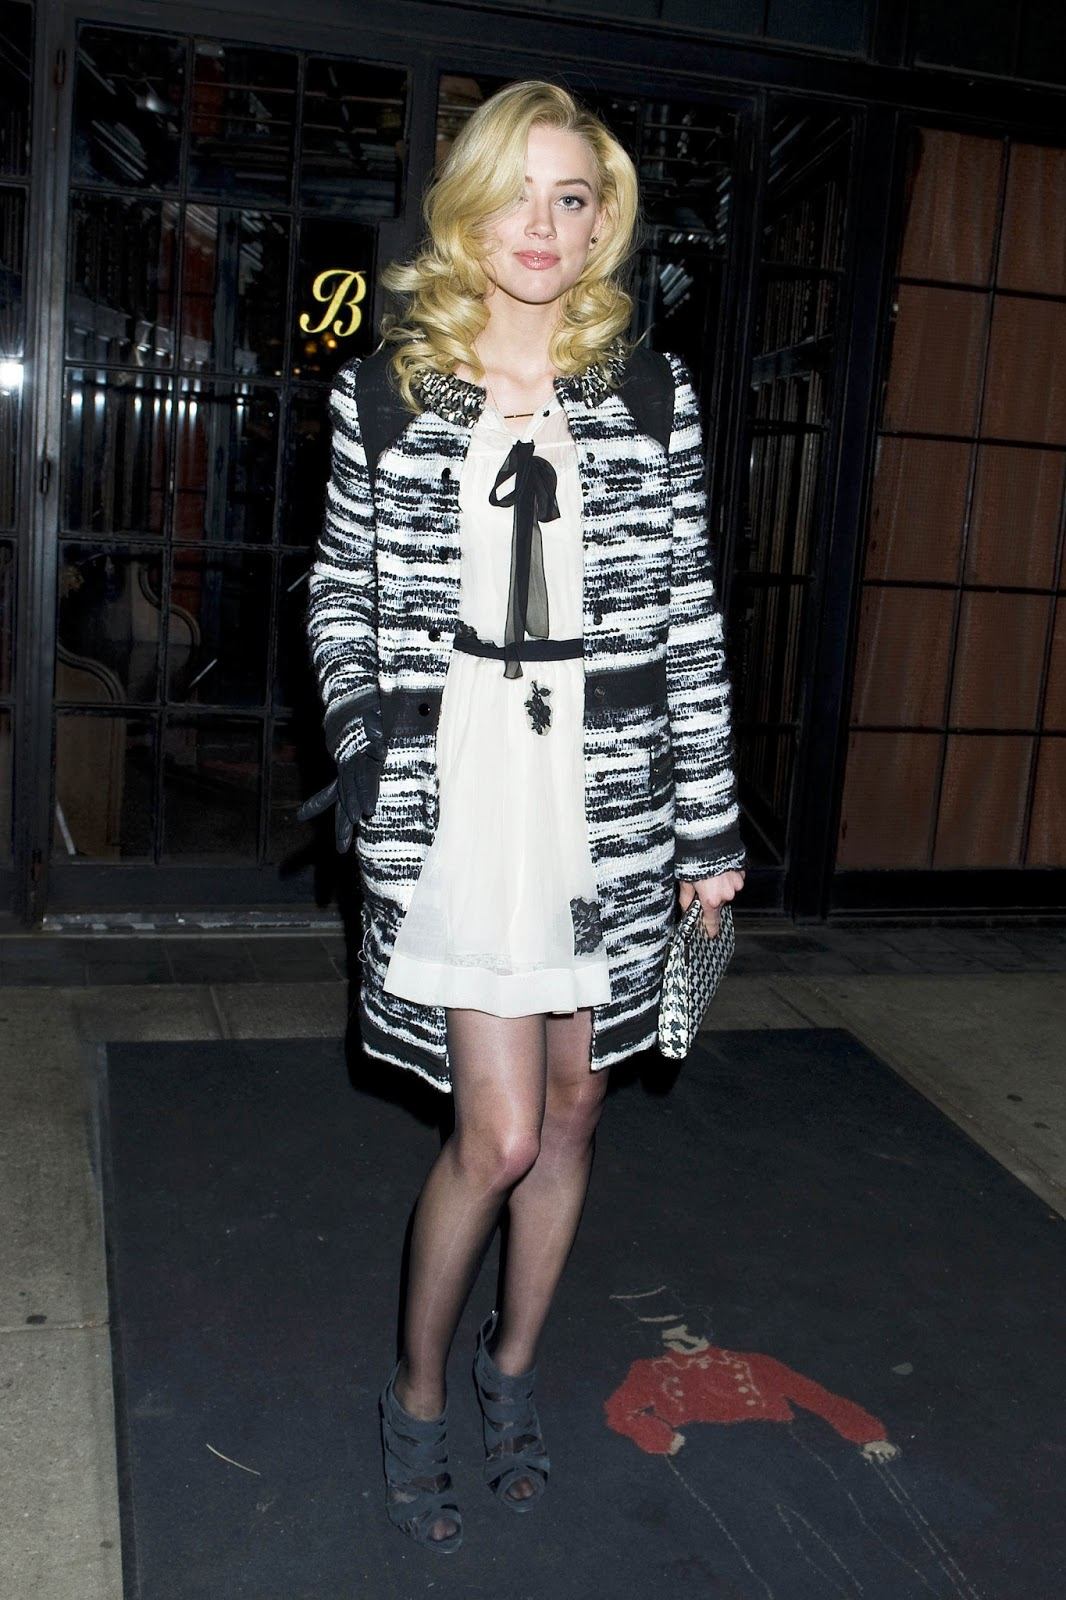 Nylon Celebrities: Amber Heard: http://nyloncelebrities.blogspot.com/2013/05/amber-heard.html